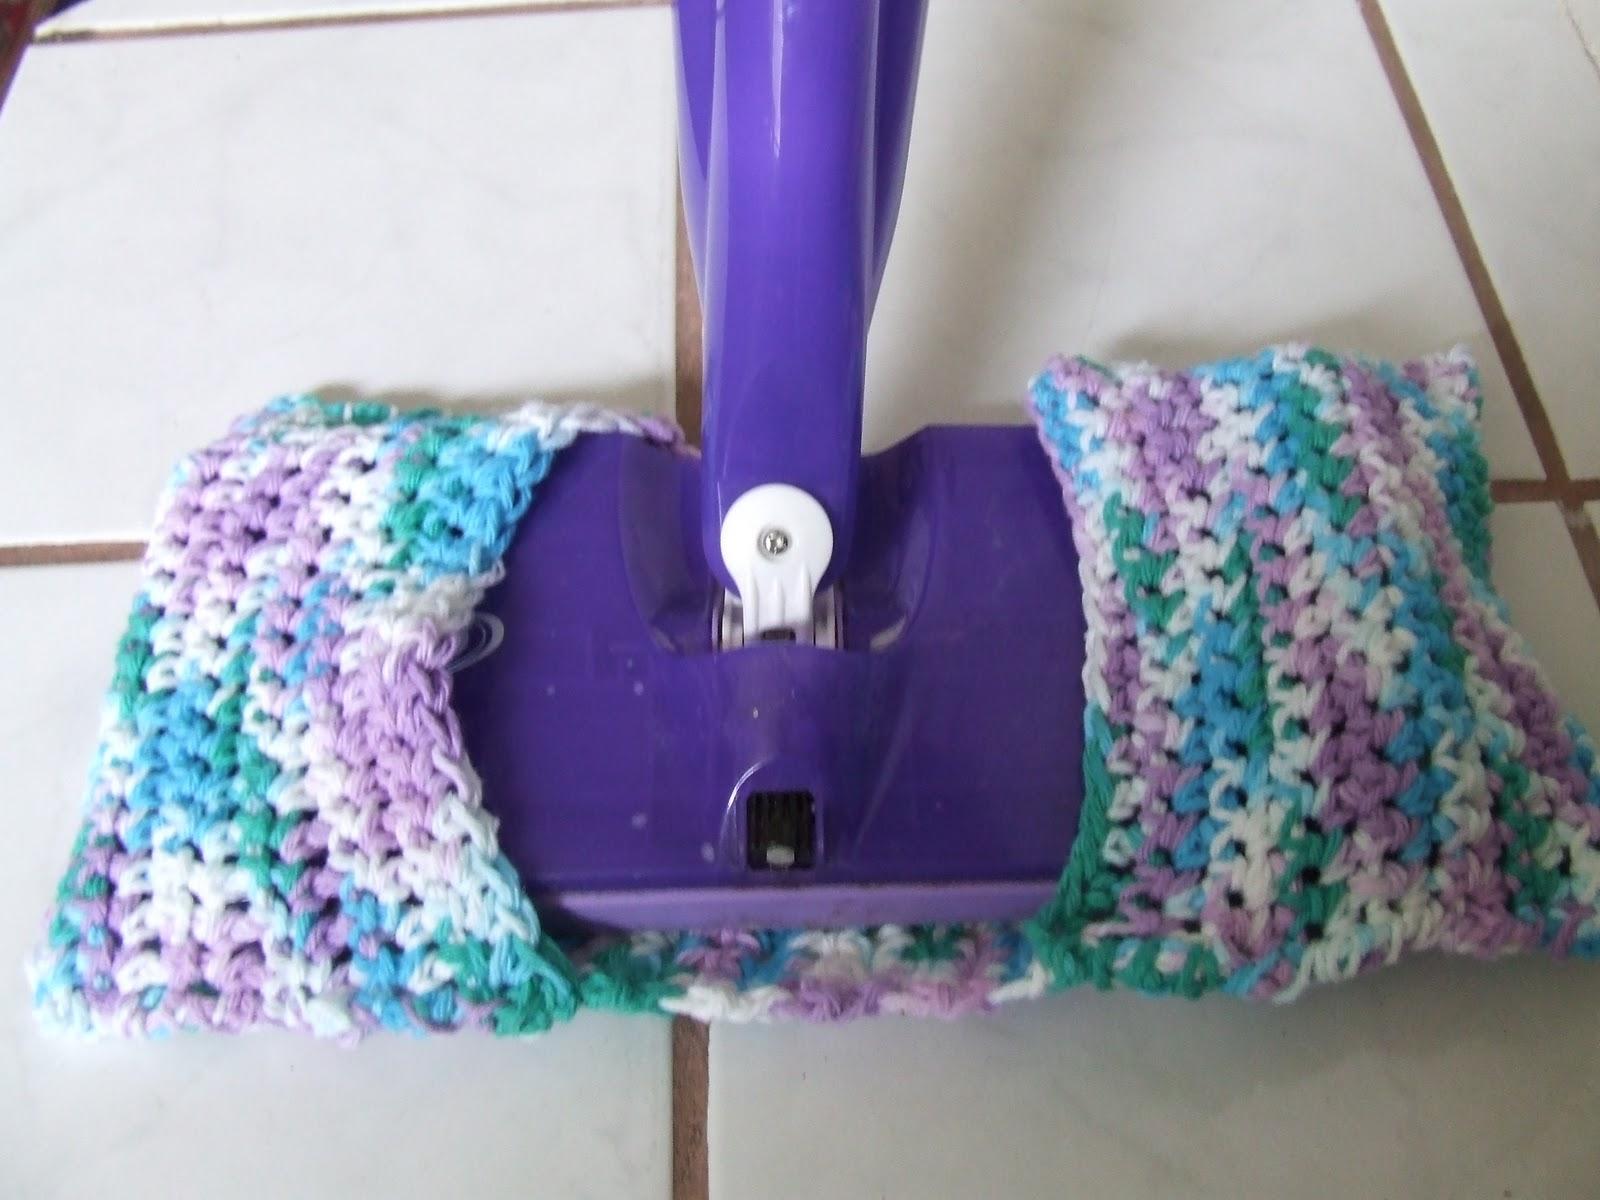 Mixed Media Swiffer Wet Jet Crocheted Cotton Pad